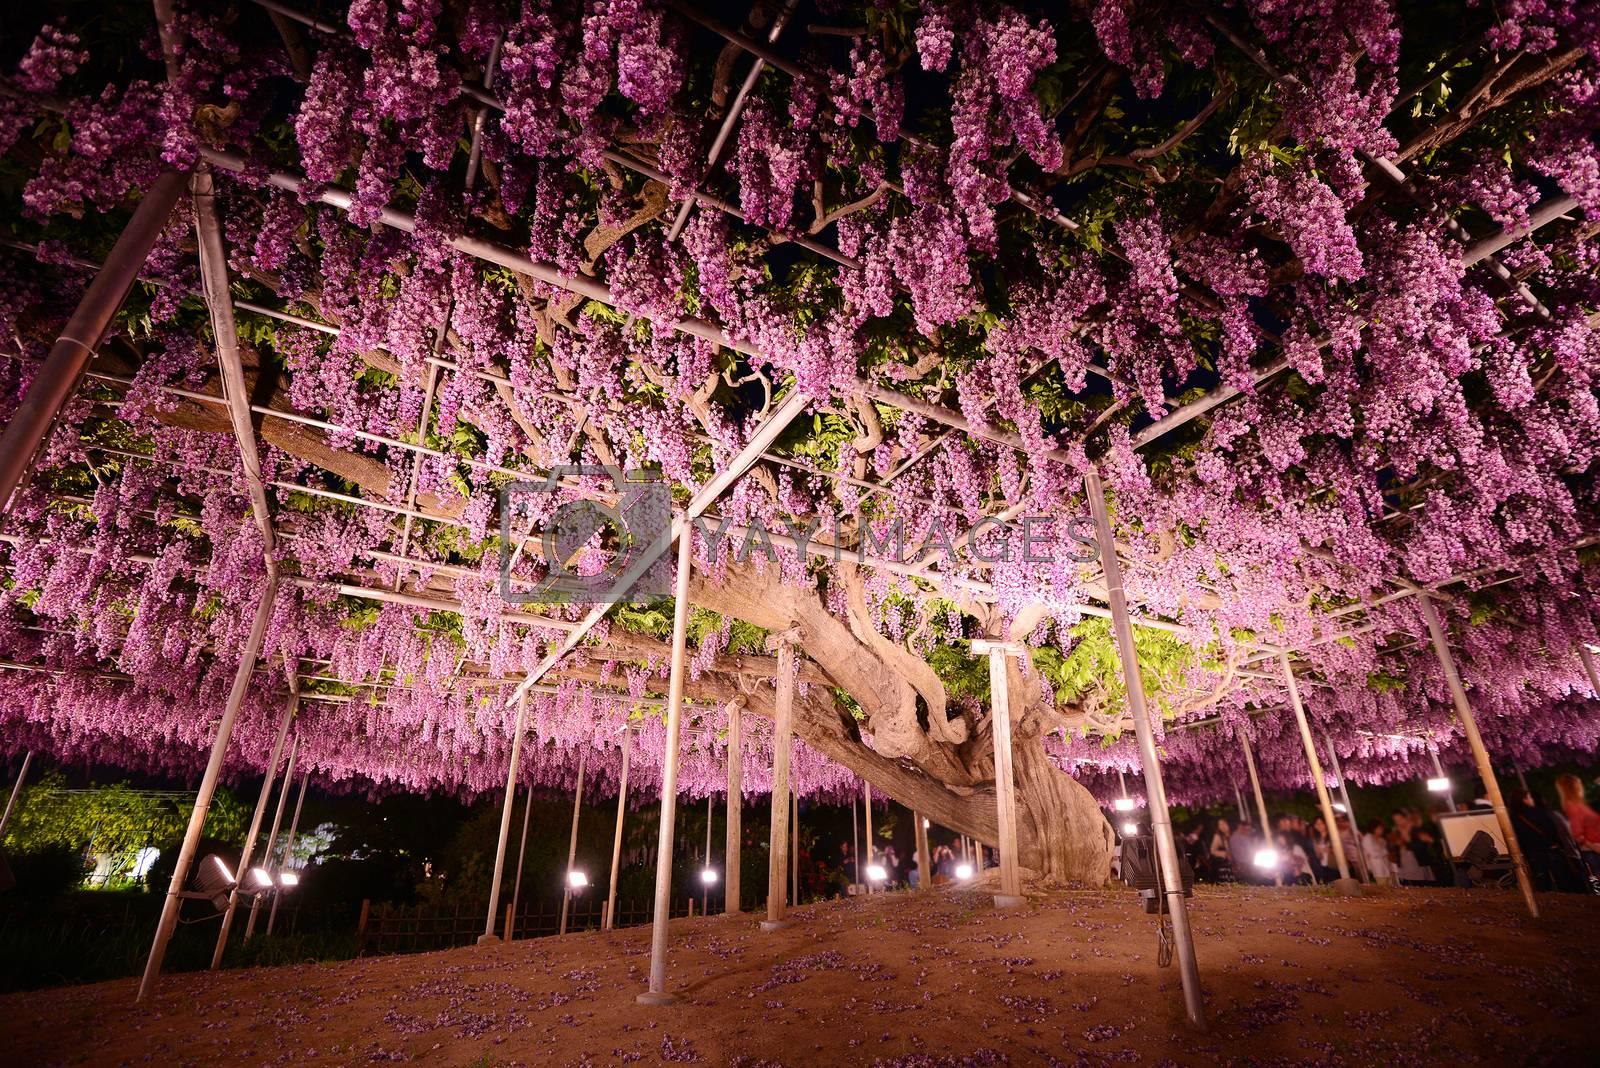 Royalty free image of wisteria park by porbital